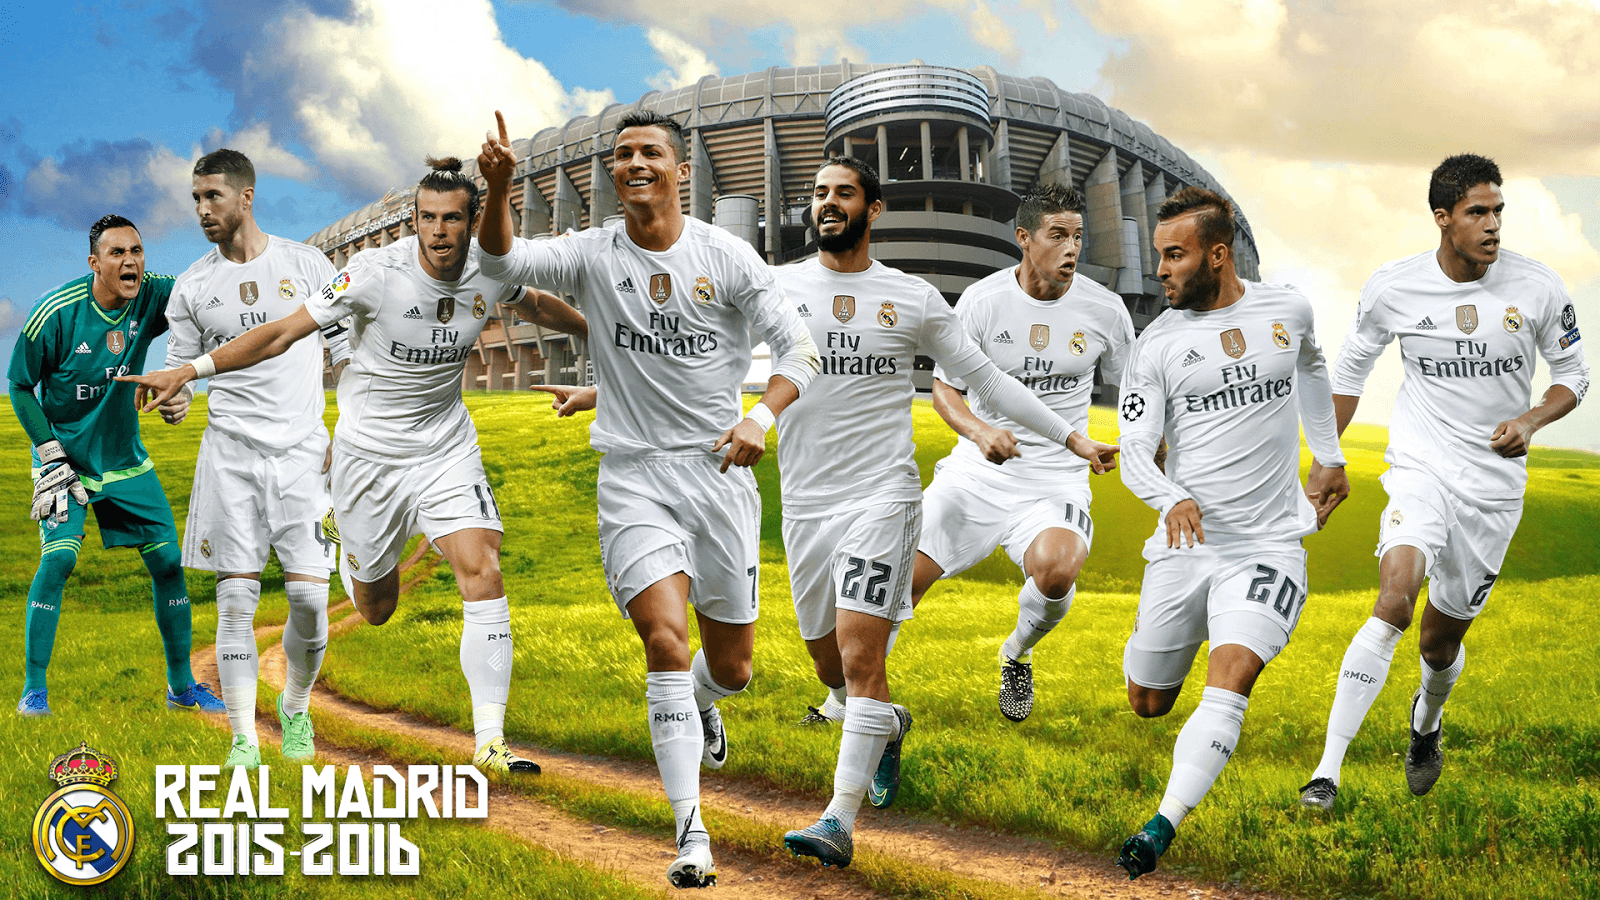 Real Madrid Wallpapers Full Hd 2016 Wallpaper Cave